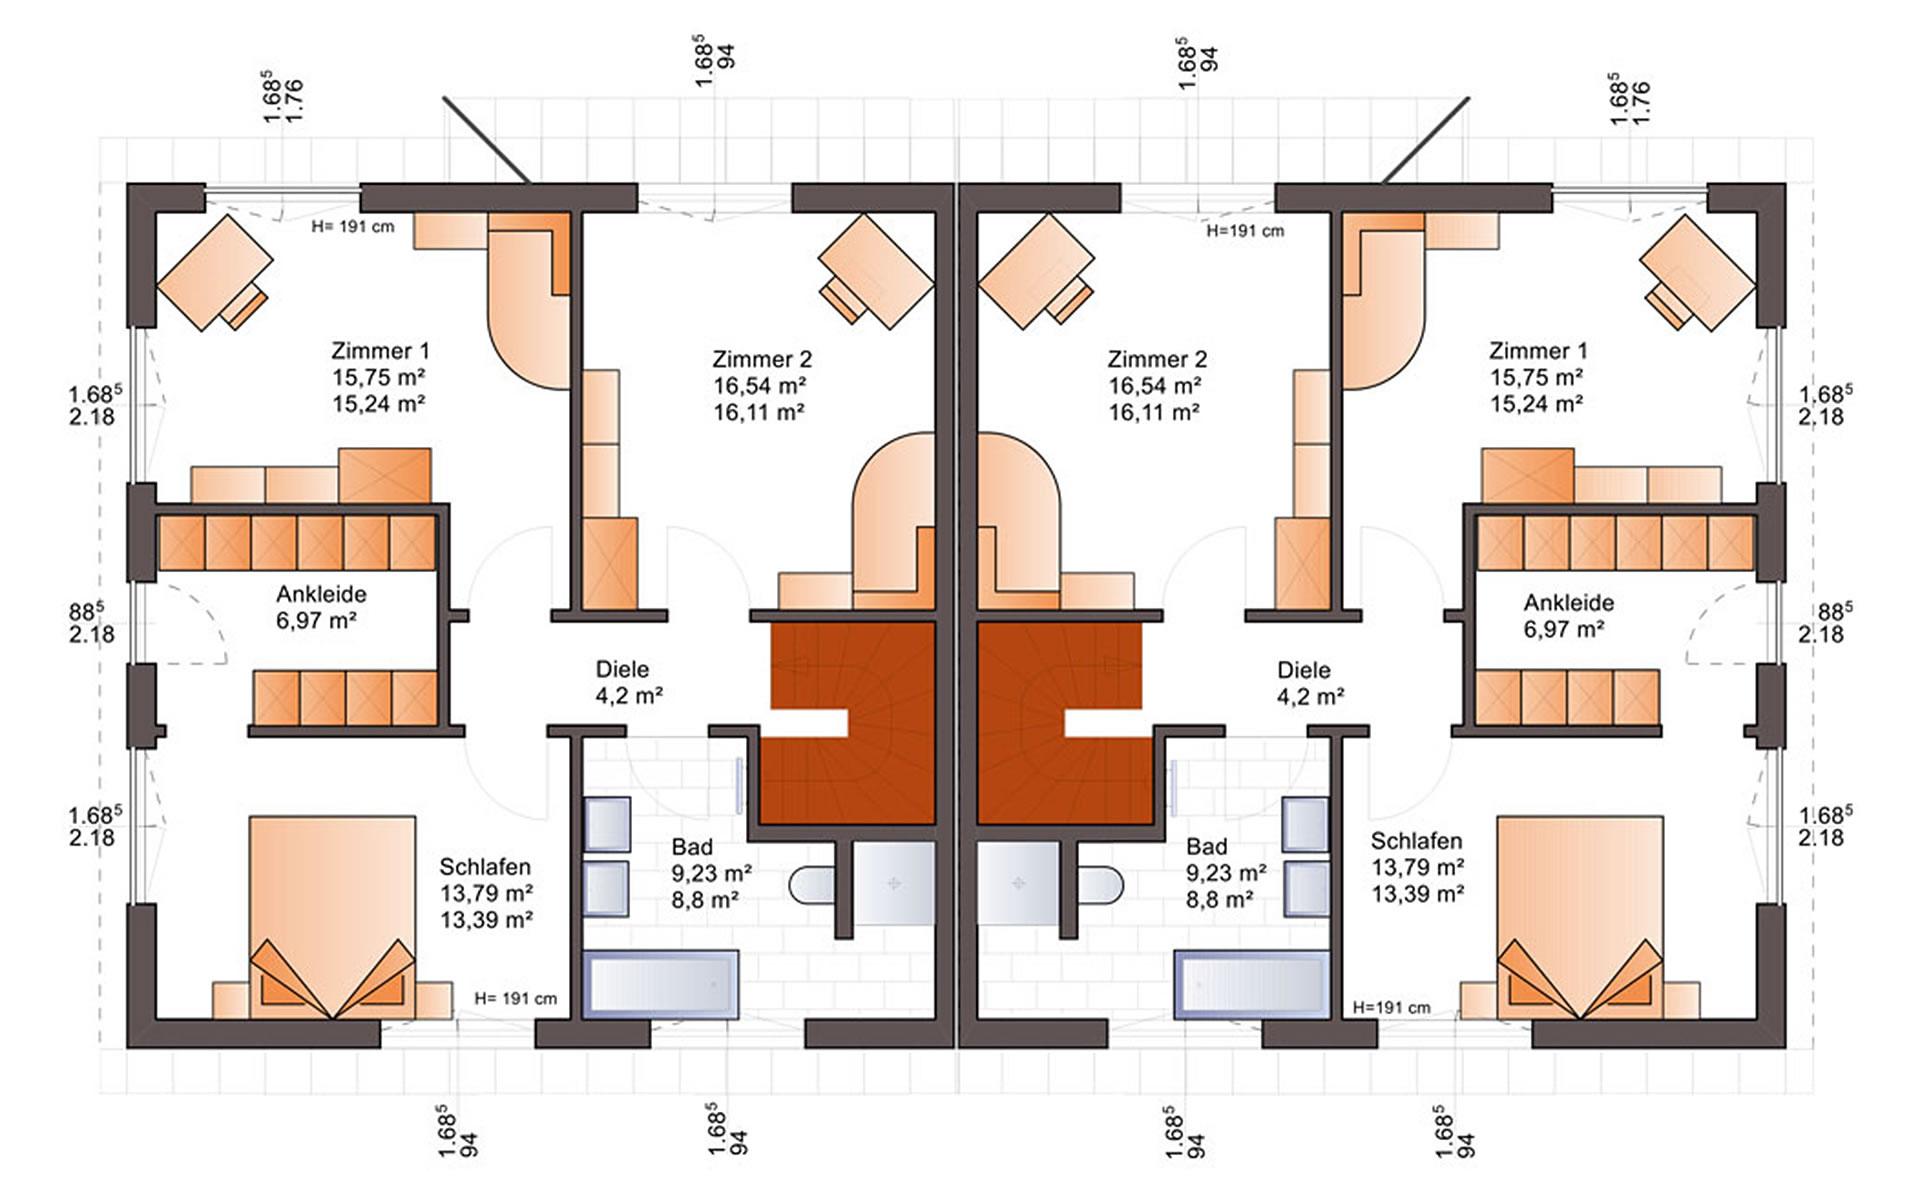 Dachgeschoss Duo 141 von Bärenhaus - das fertige Haus GmbH